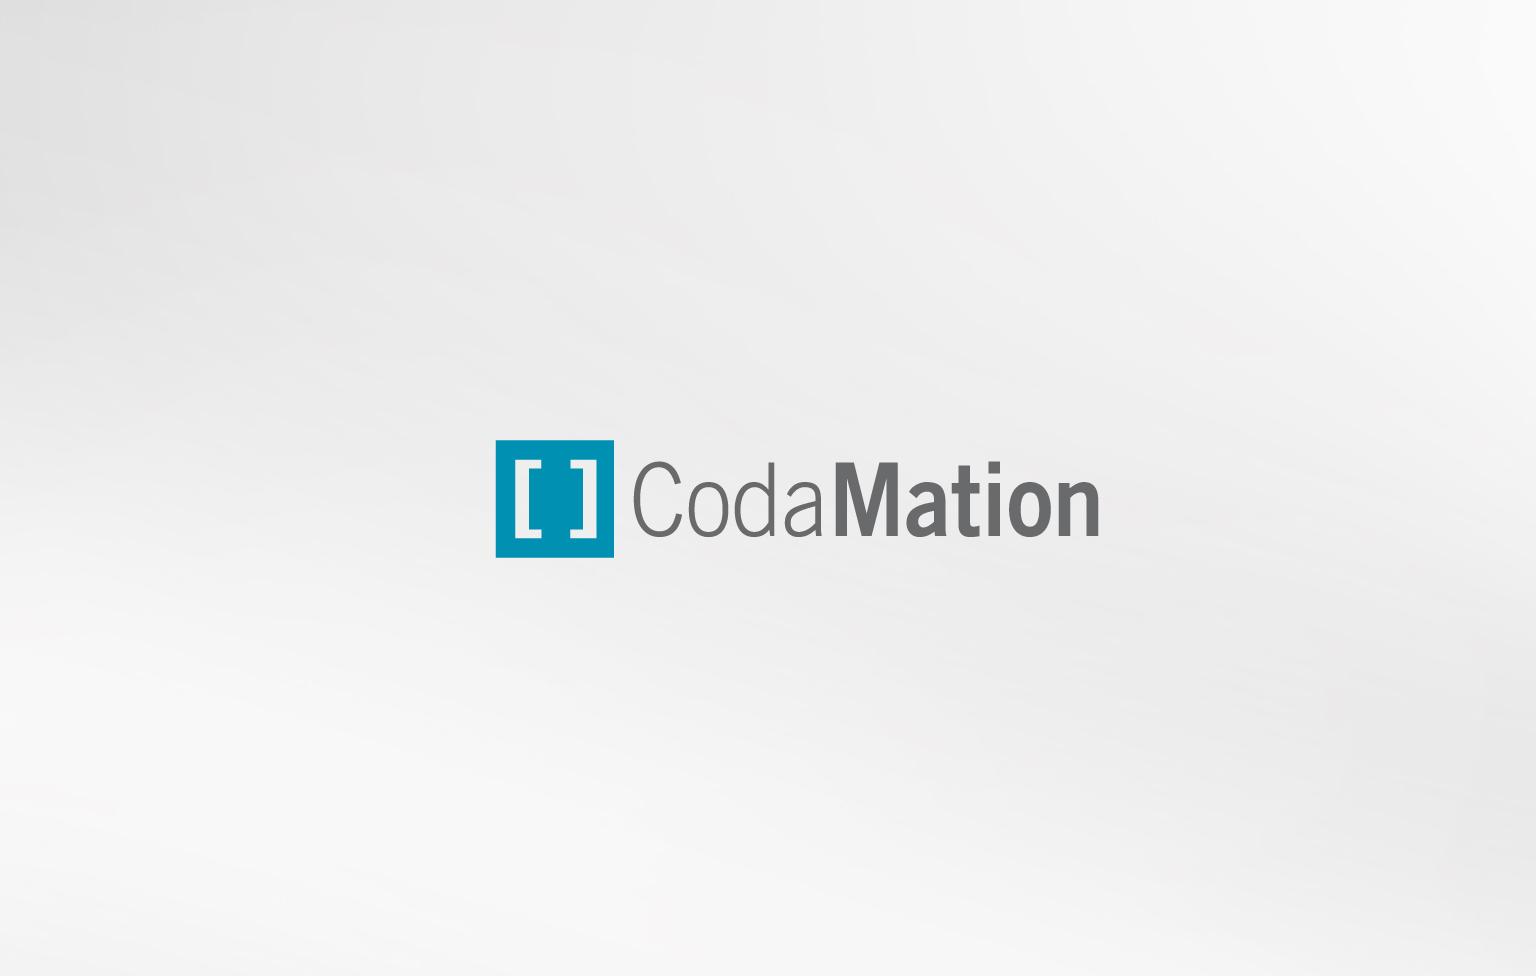 CodaMation